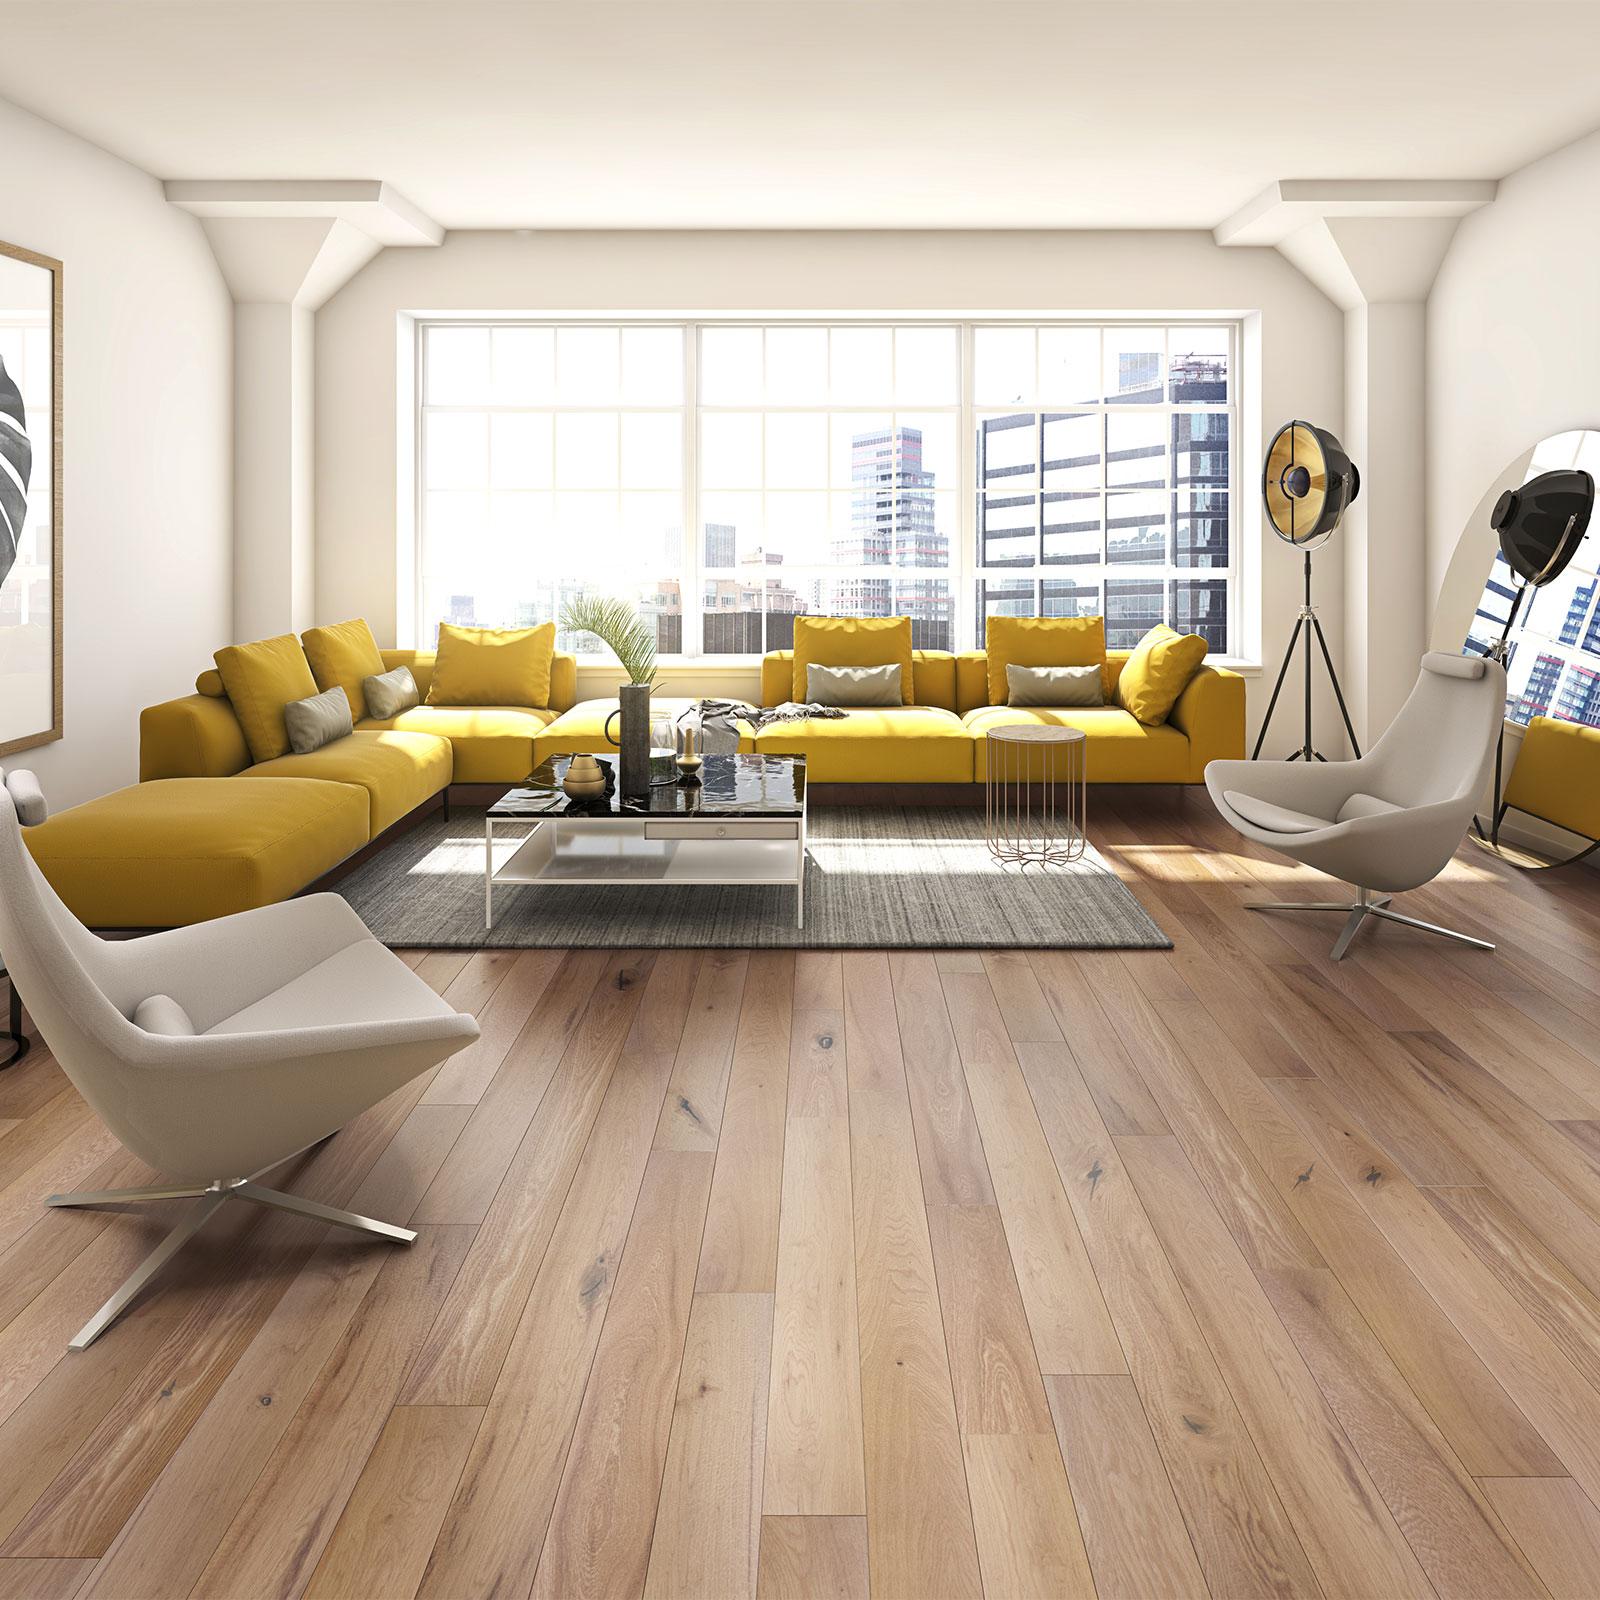 oak wood floor living room mini bar ideas for fitting flooring over underfloor heating woodpecker professional harlech rustic